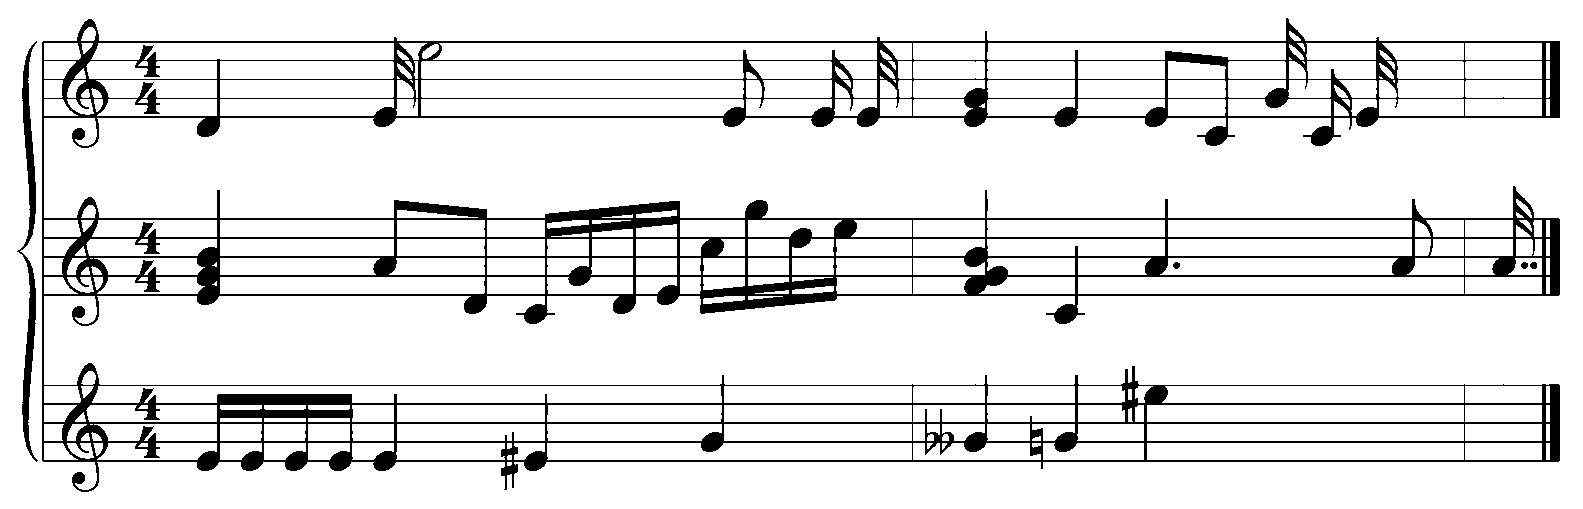 Binary Image